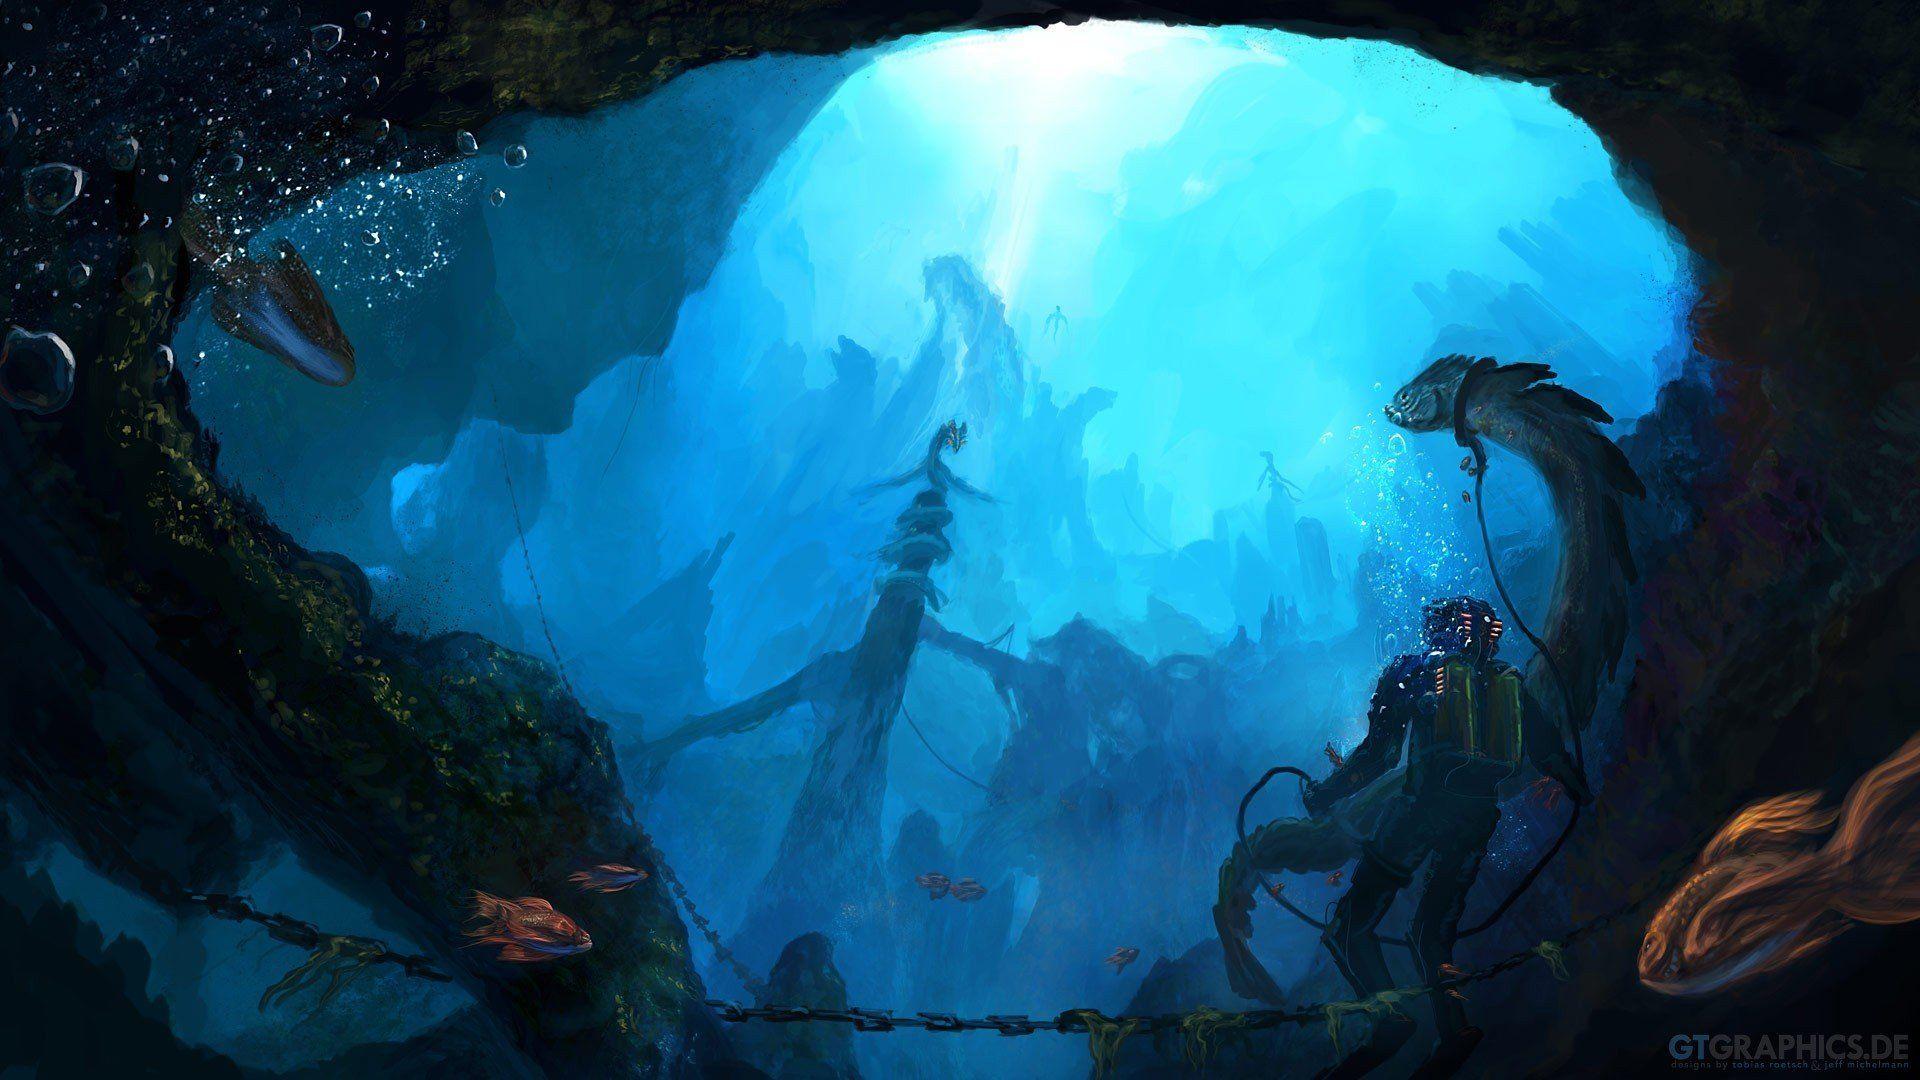 Walldevil Wallpapers A88 World Fantasy Wallpaper Sea Underwater Creatures Art Artwork Diver